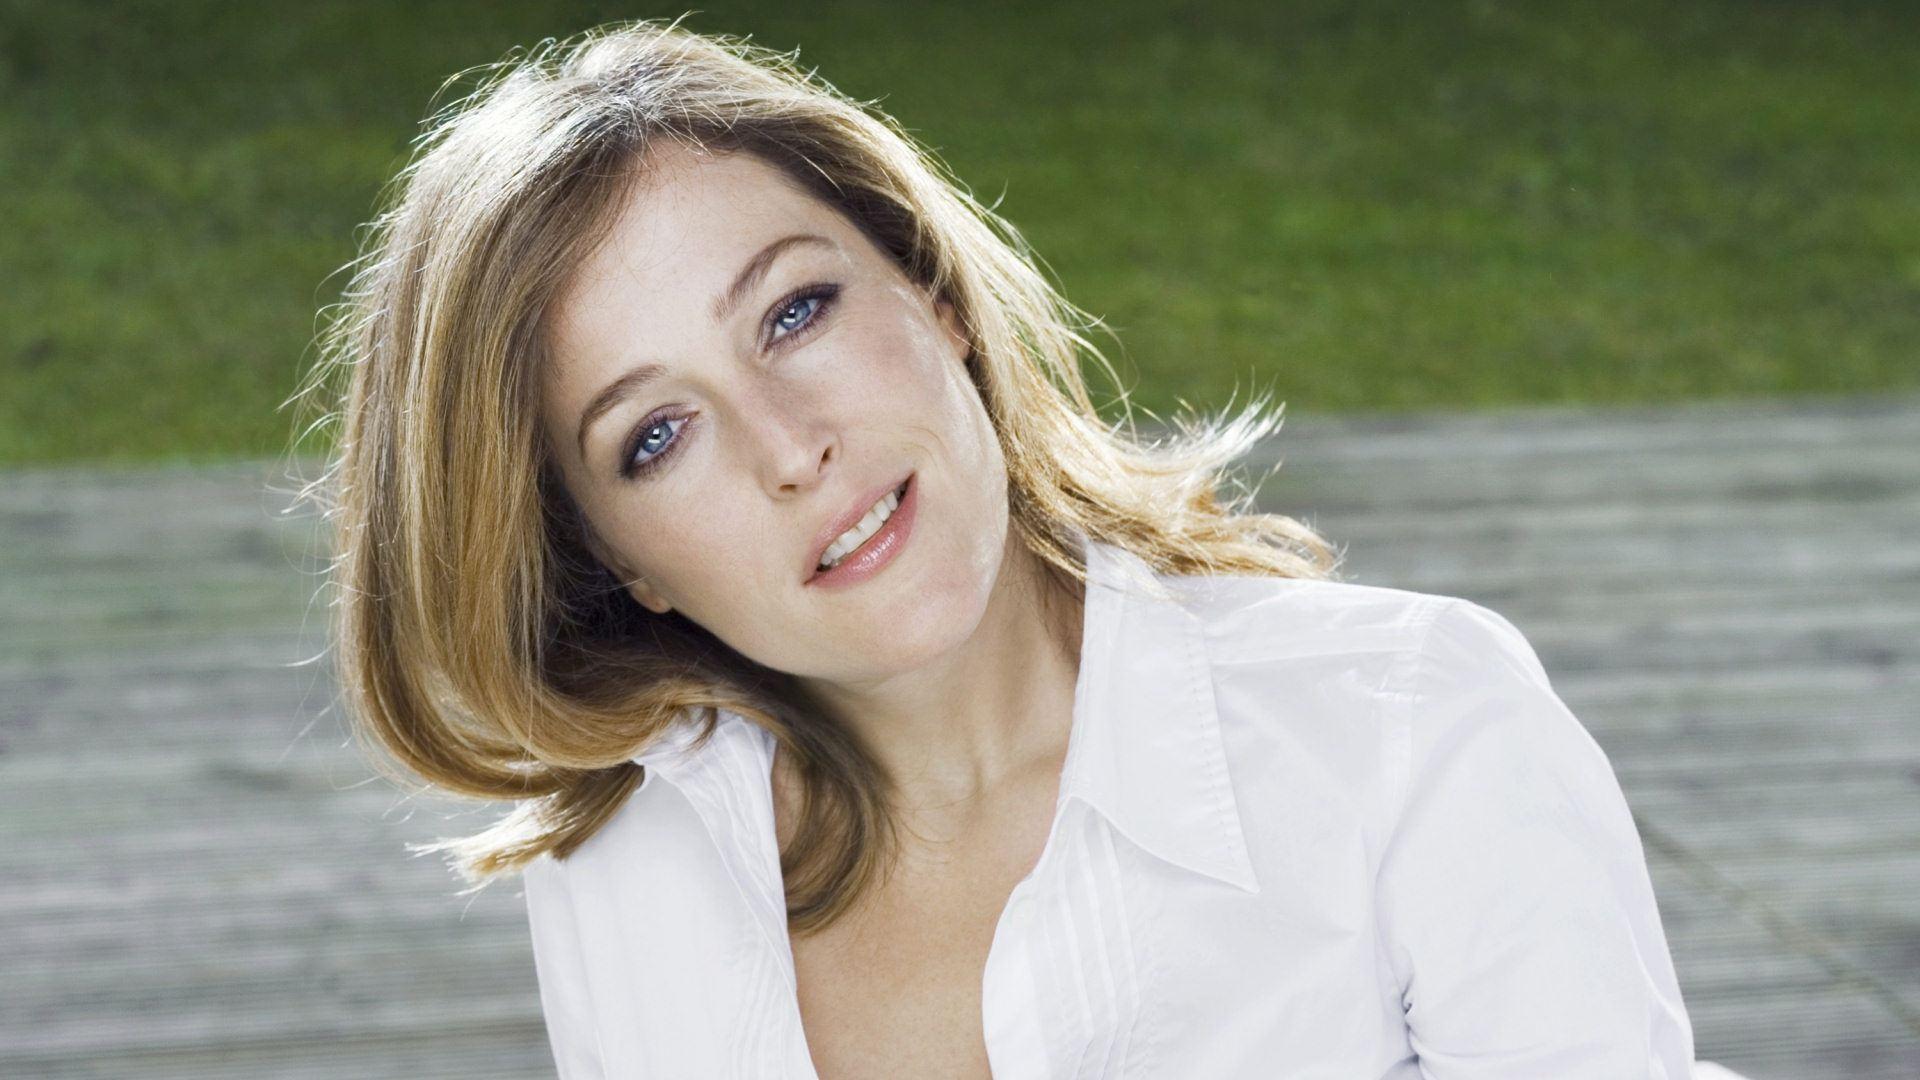 Gillian Anderson Wallpapers Hd